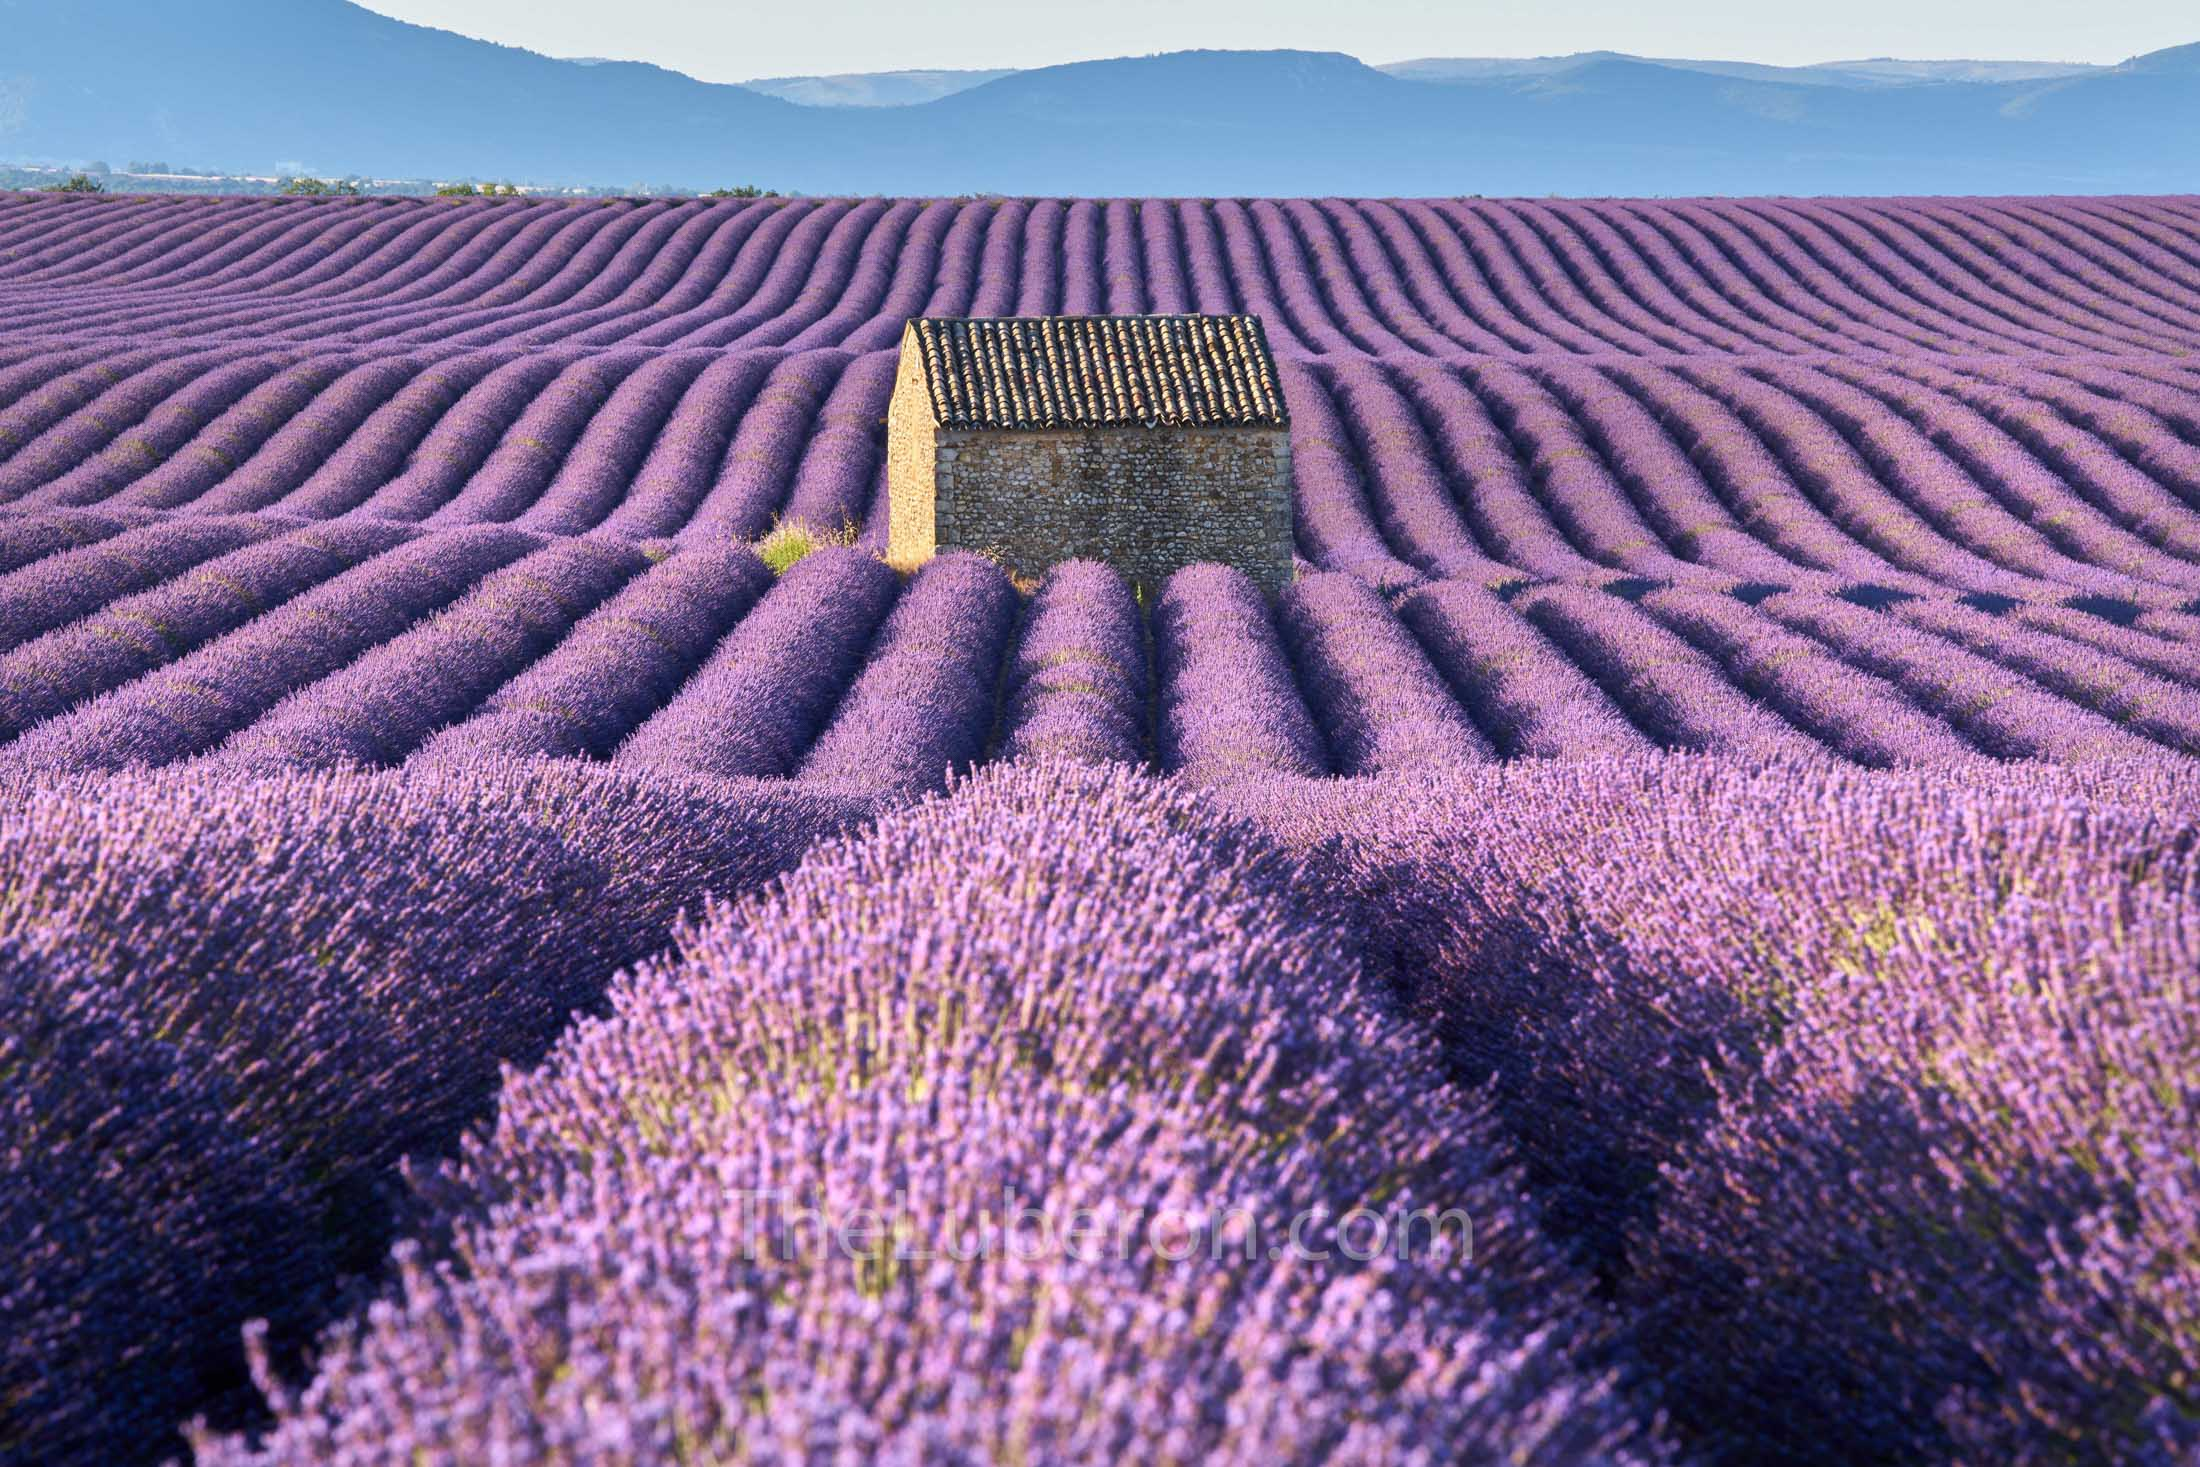 Hut in lavedner field in Valensole